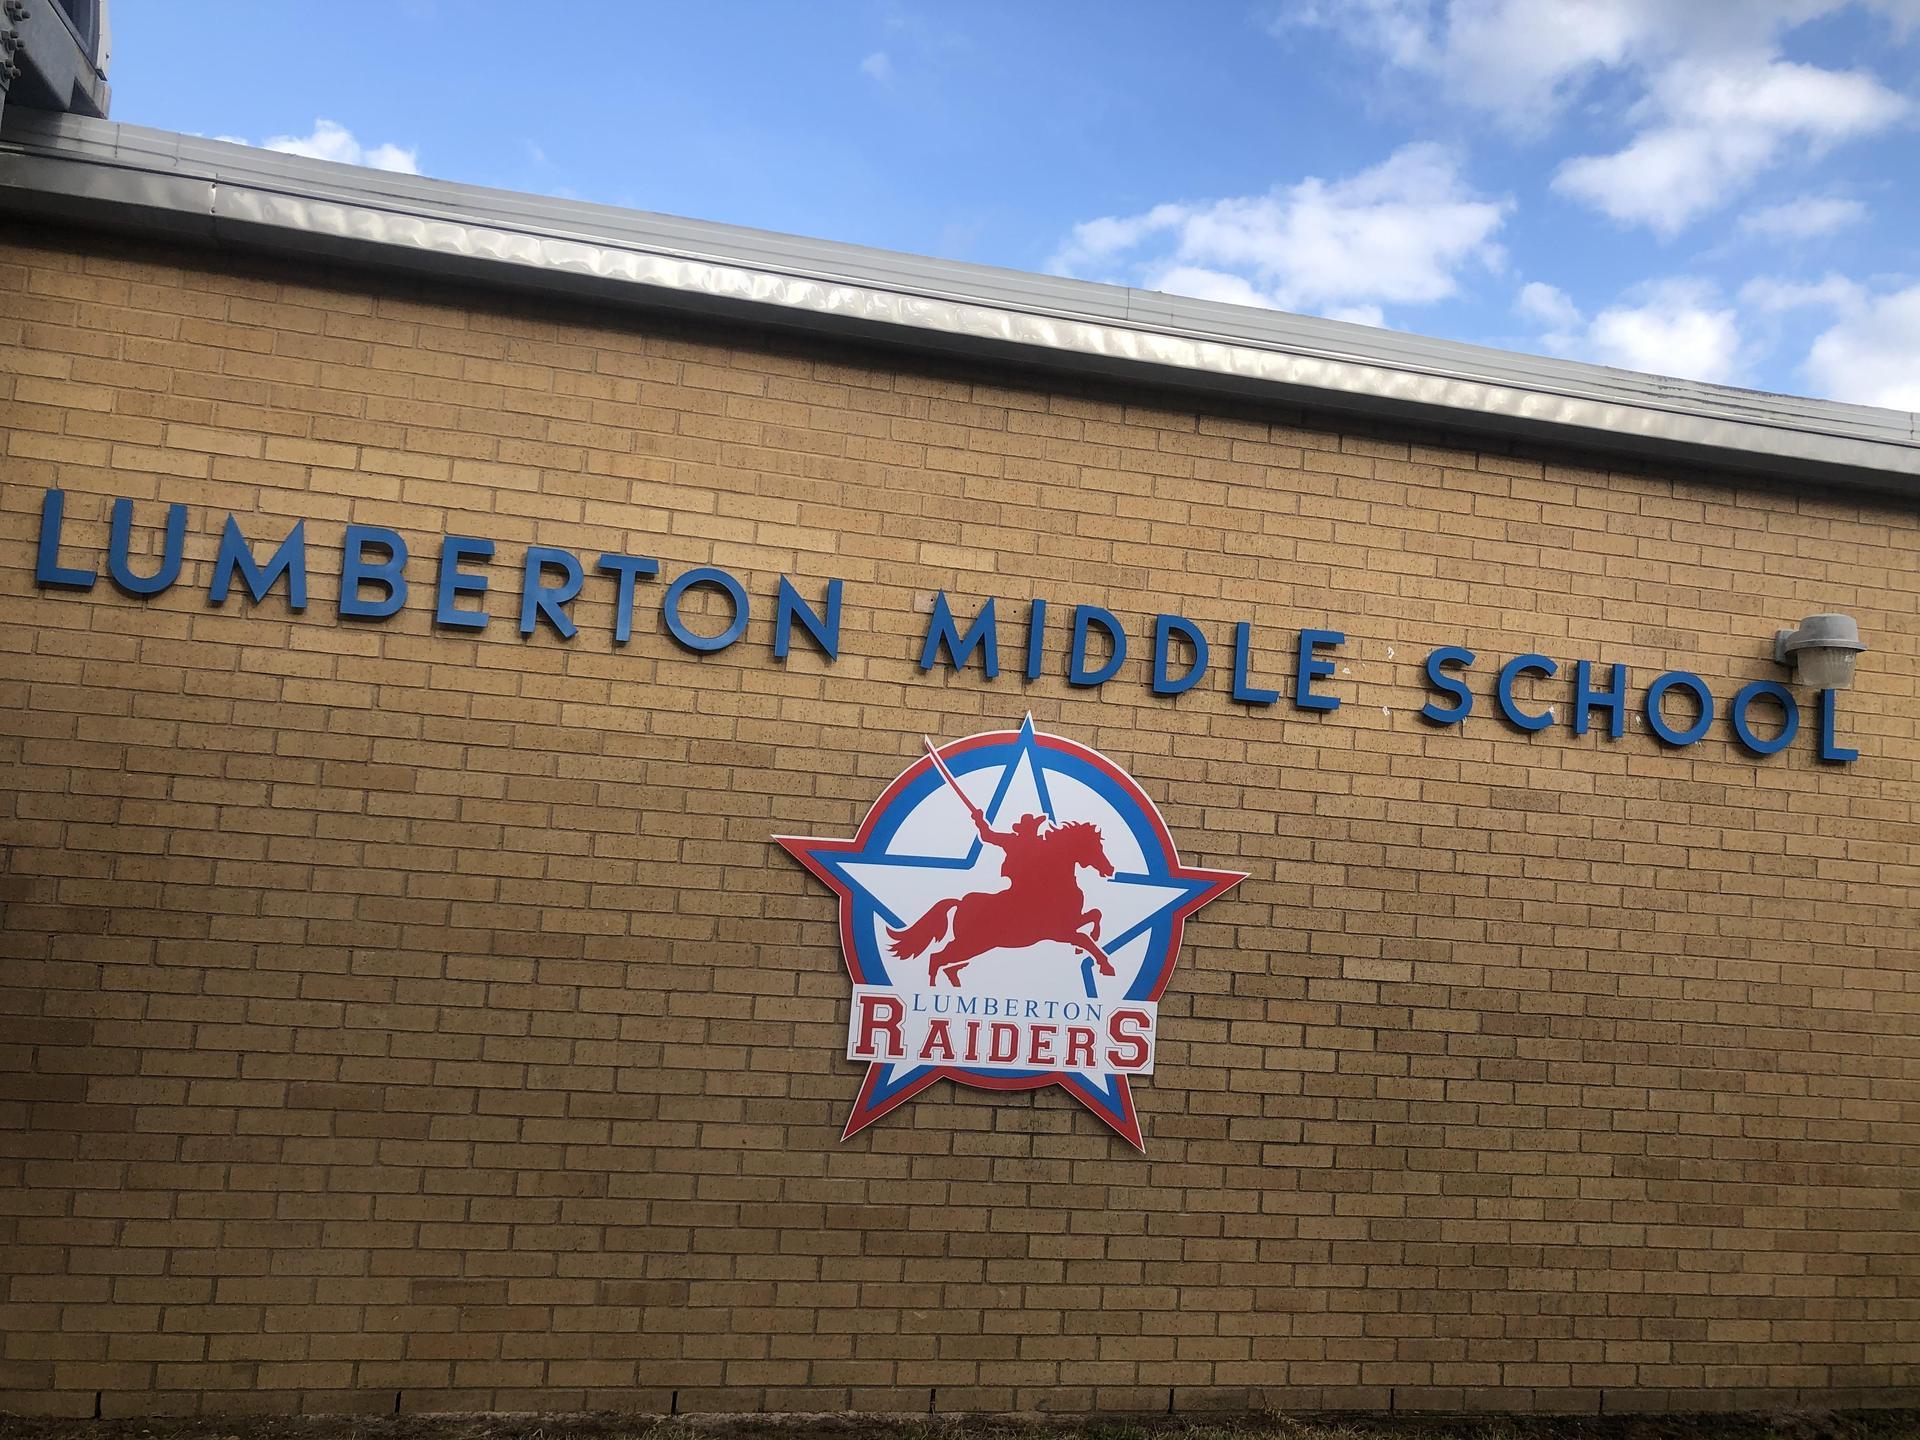 Lumberton Middle School Signage